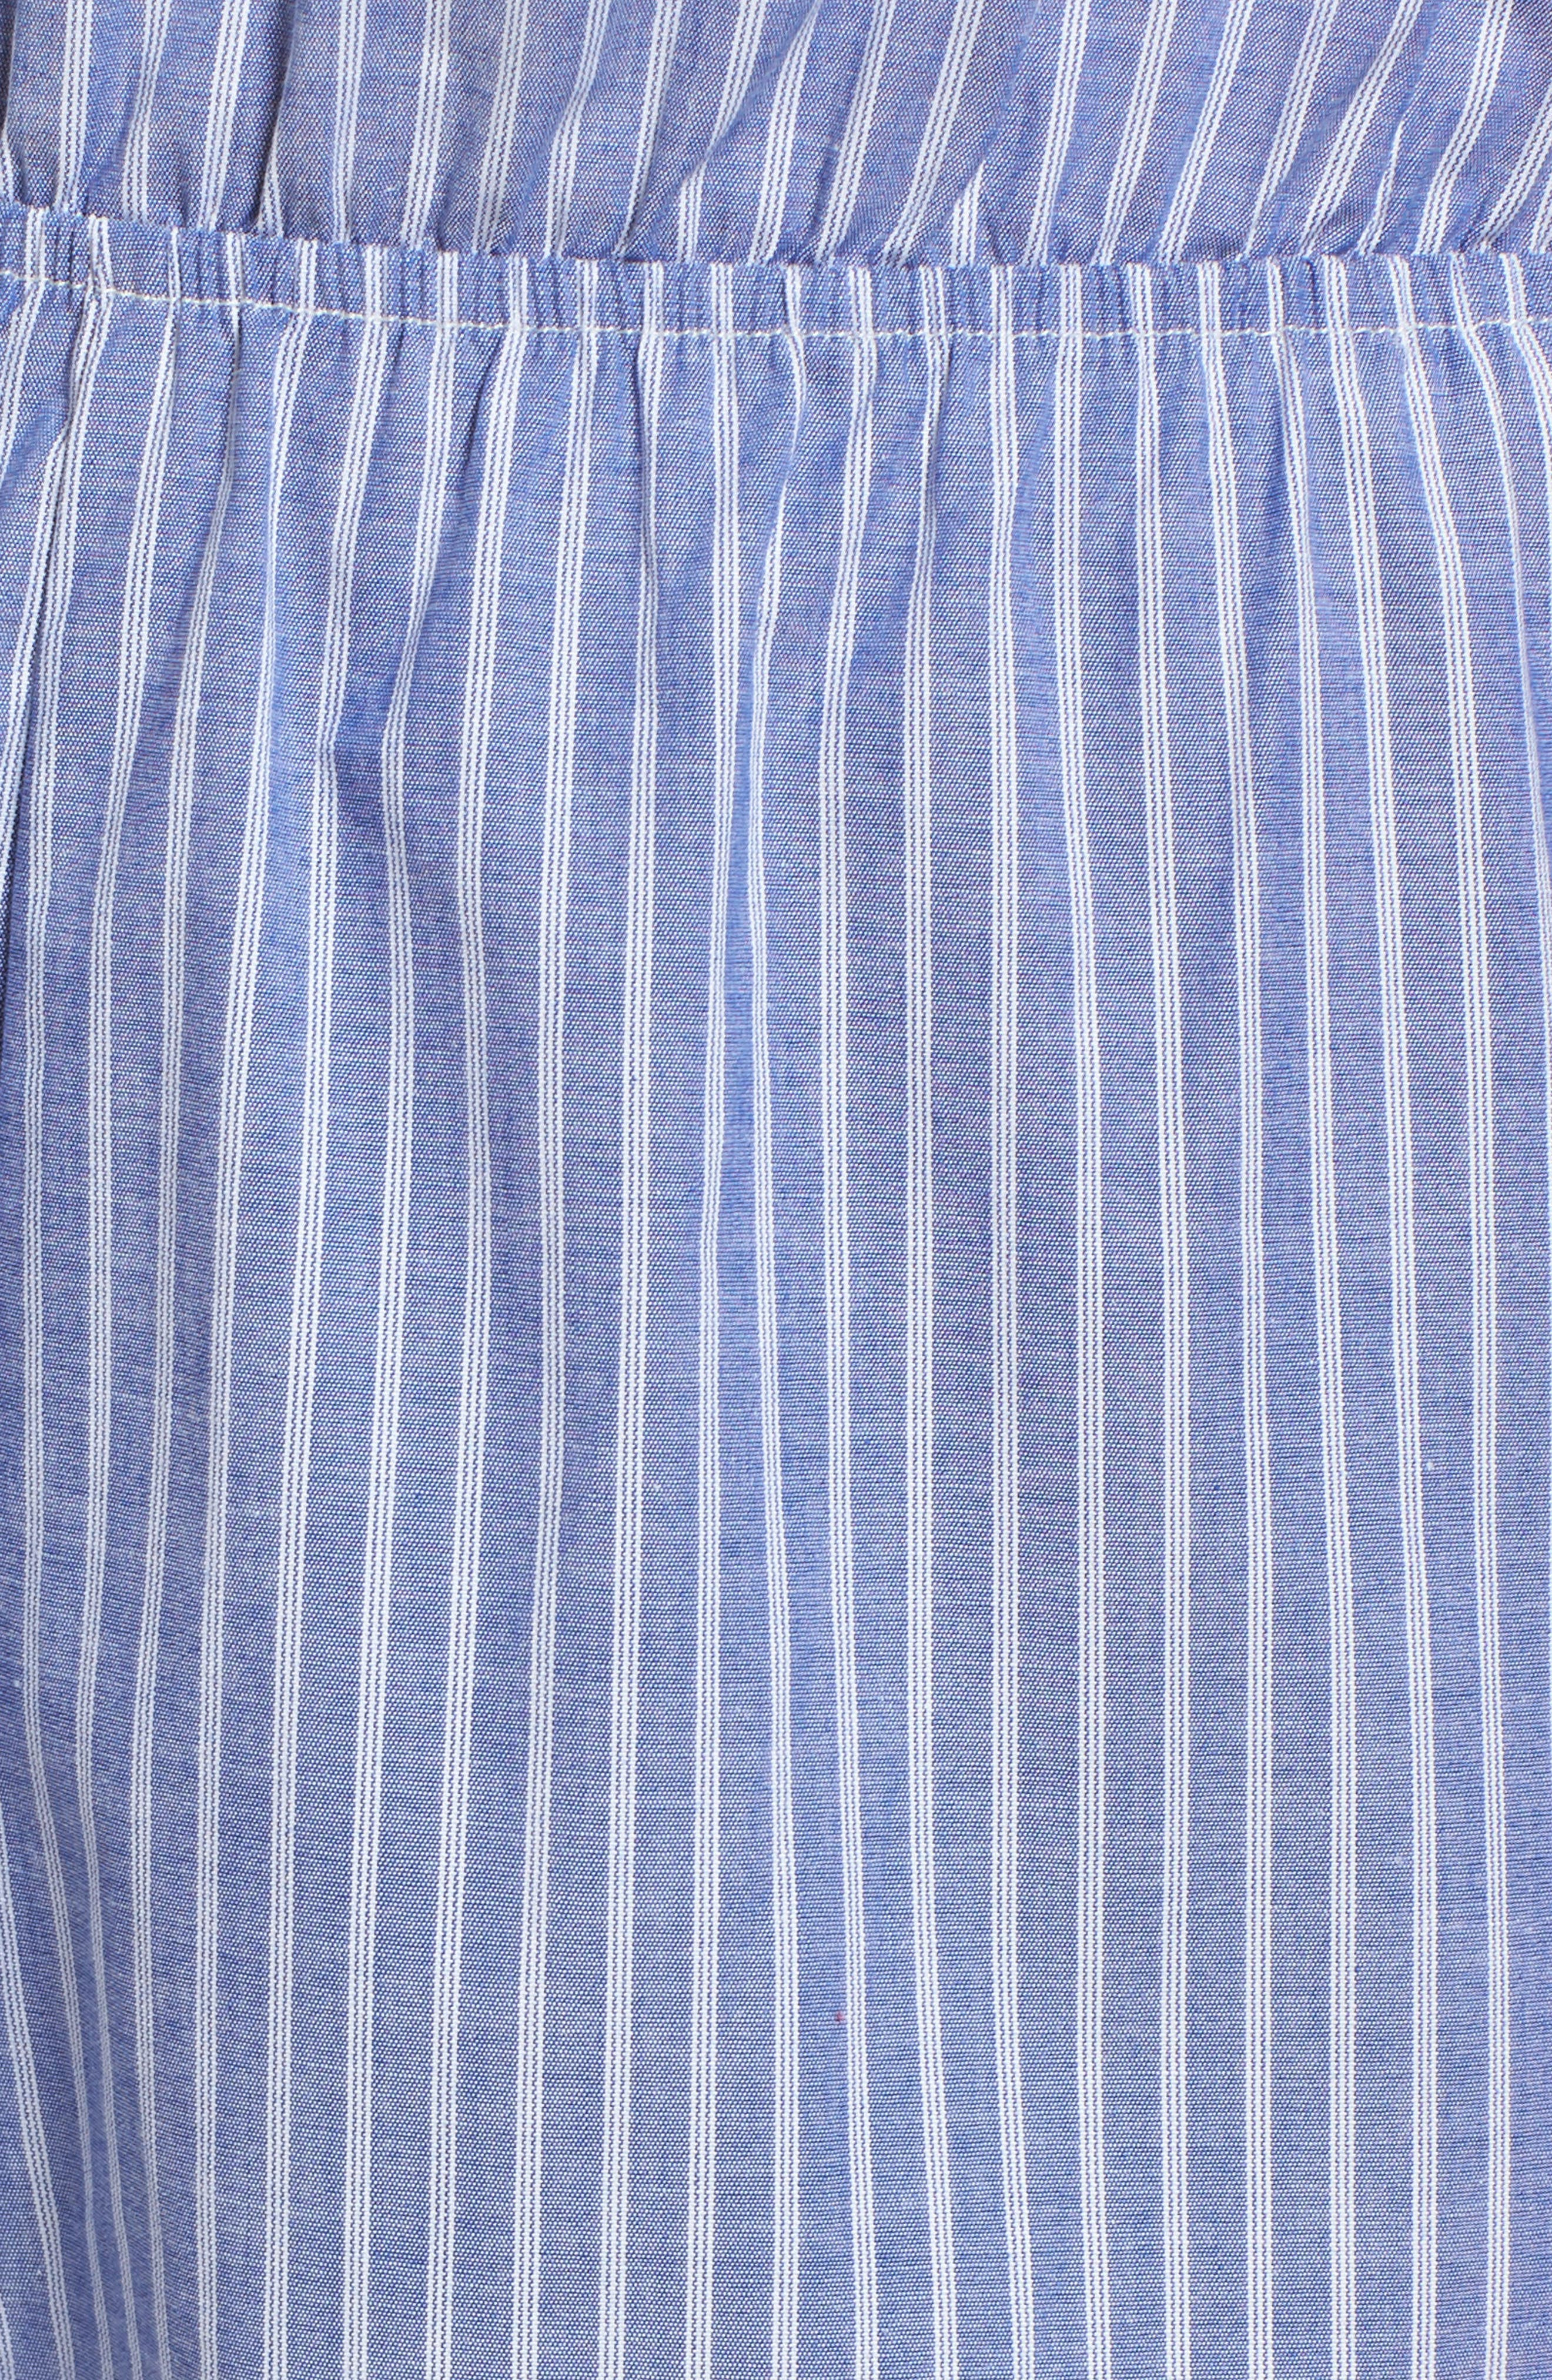 Stripe Off the Shoulder Jumpsuit,                             Alternate thumbnail 5, color,                             460